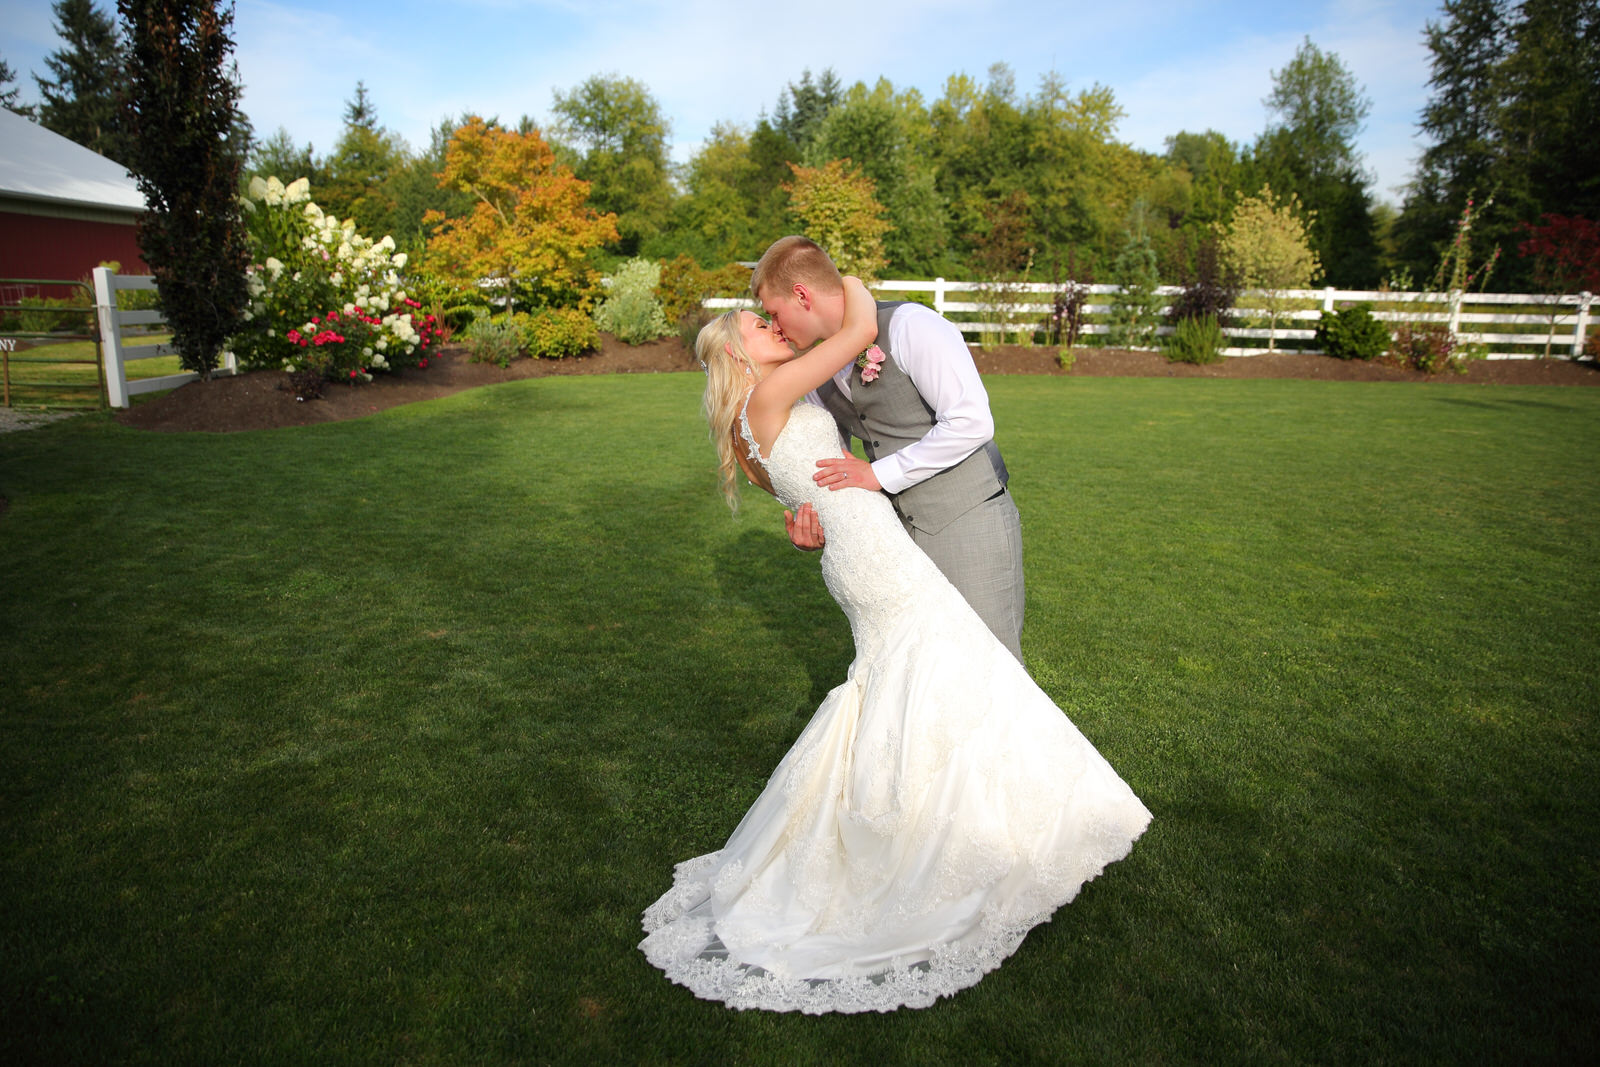 Bride and Groom at Filigree Farms in Buckley Washington